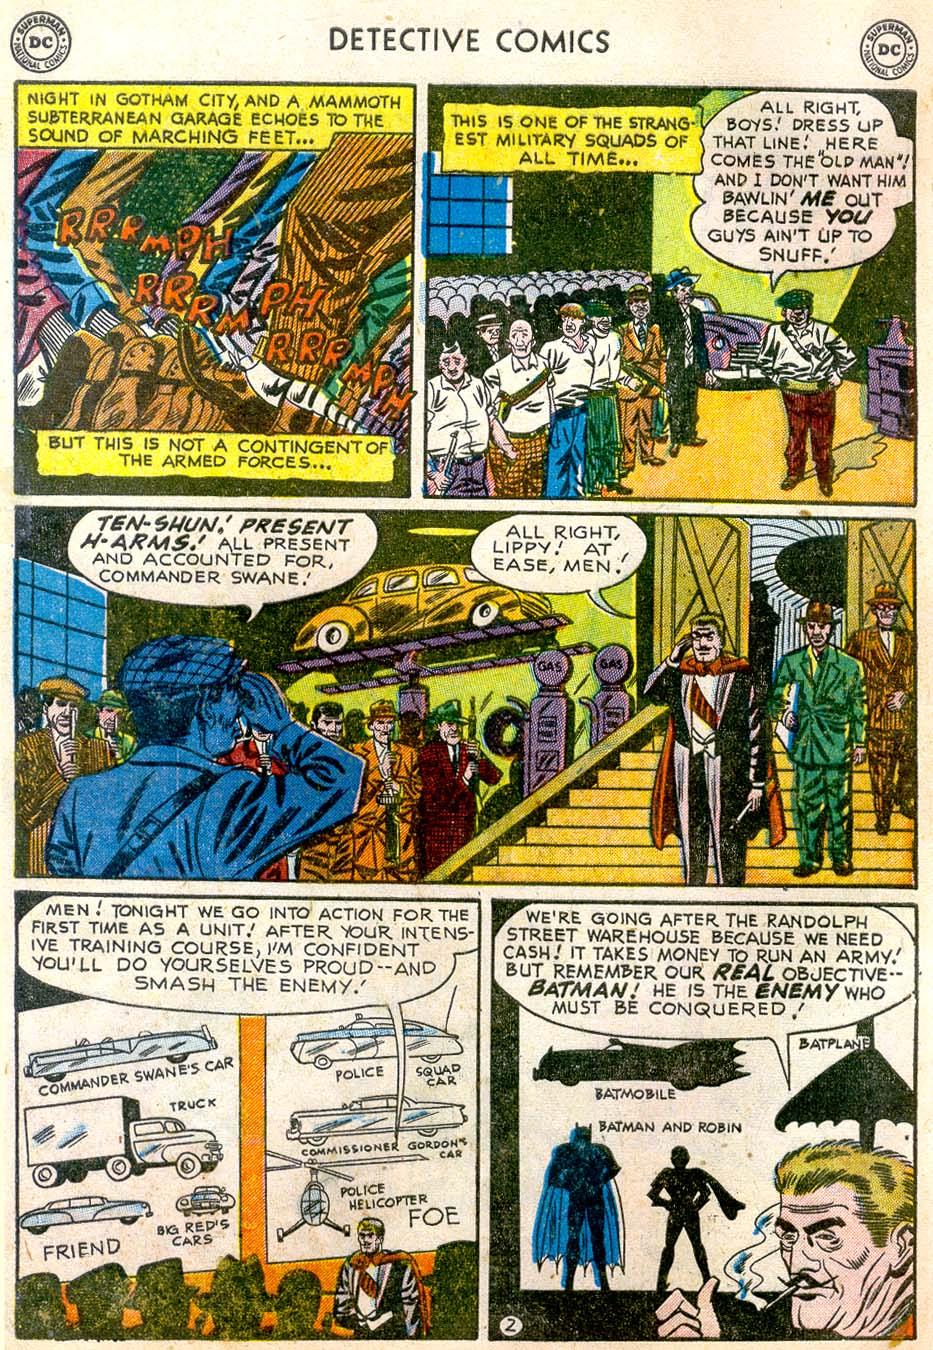 Detective Comics (1937) 178 Page 3